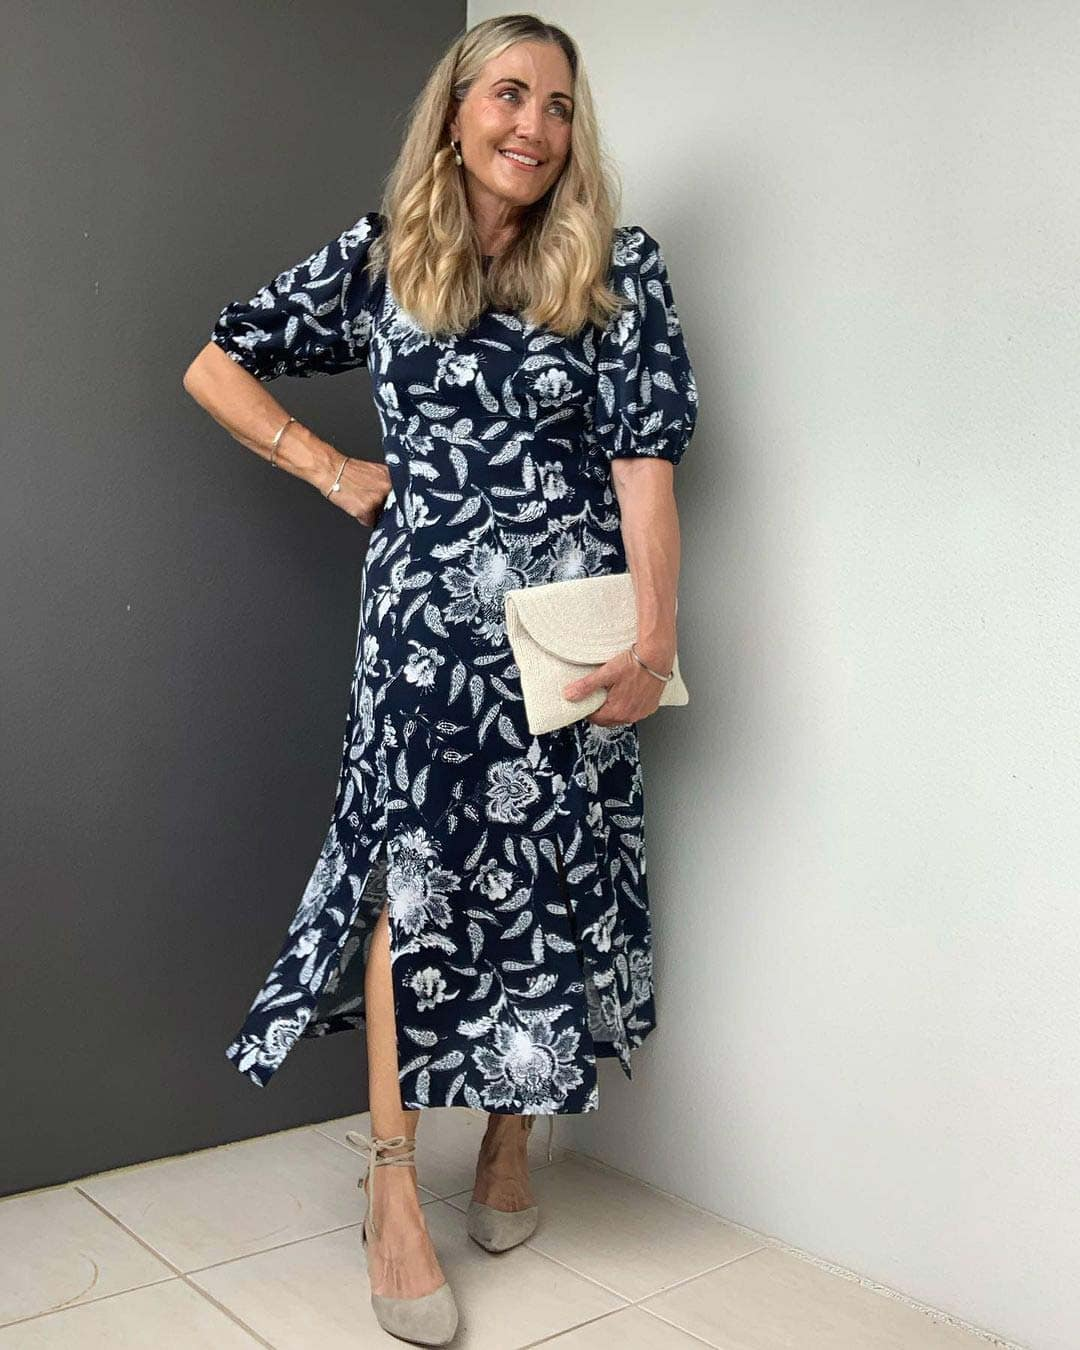 Melinda wears a monochrome dress | 40plusstyle.com